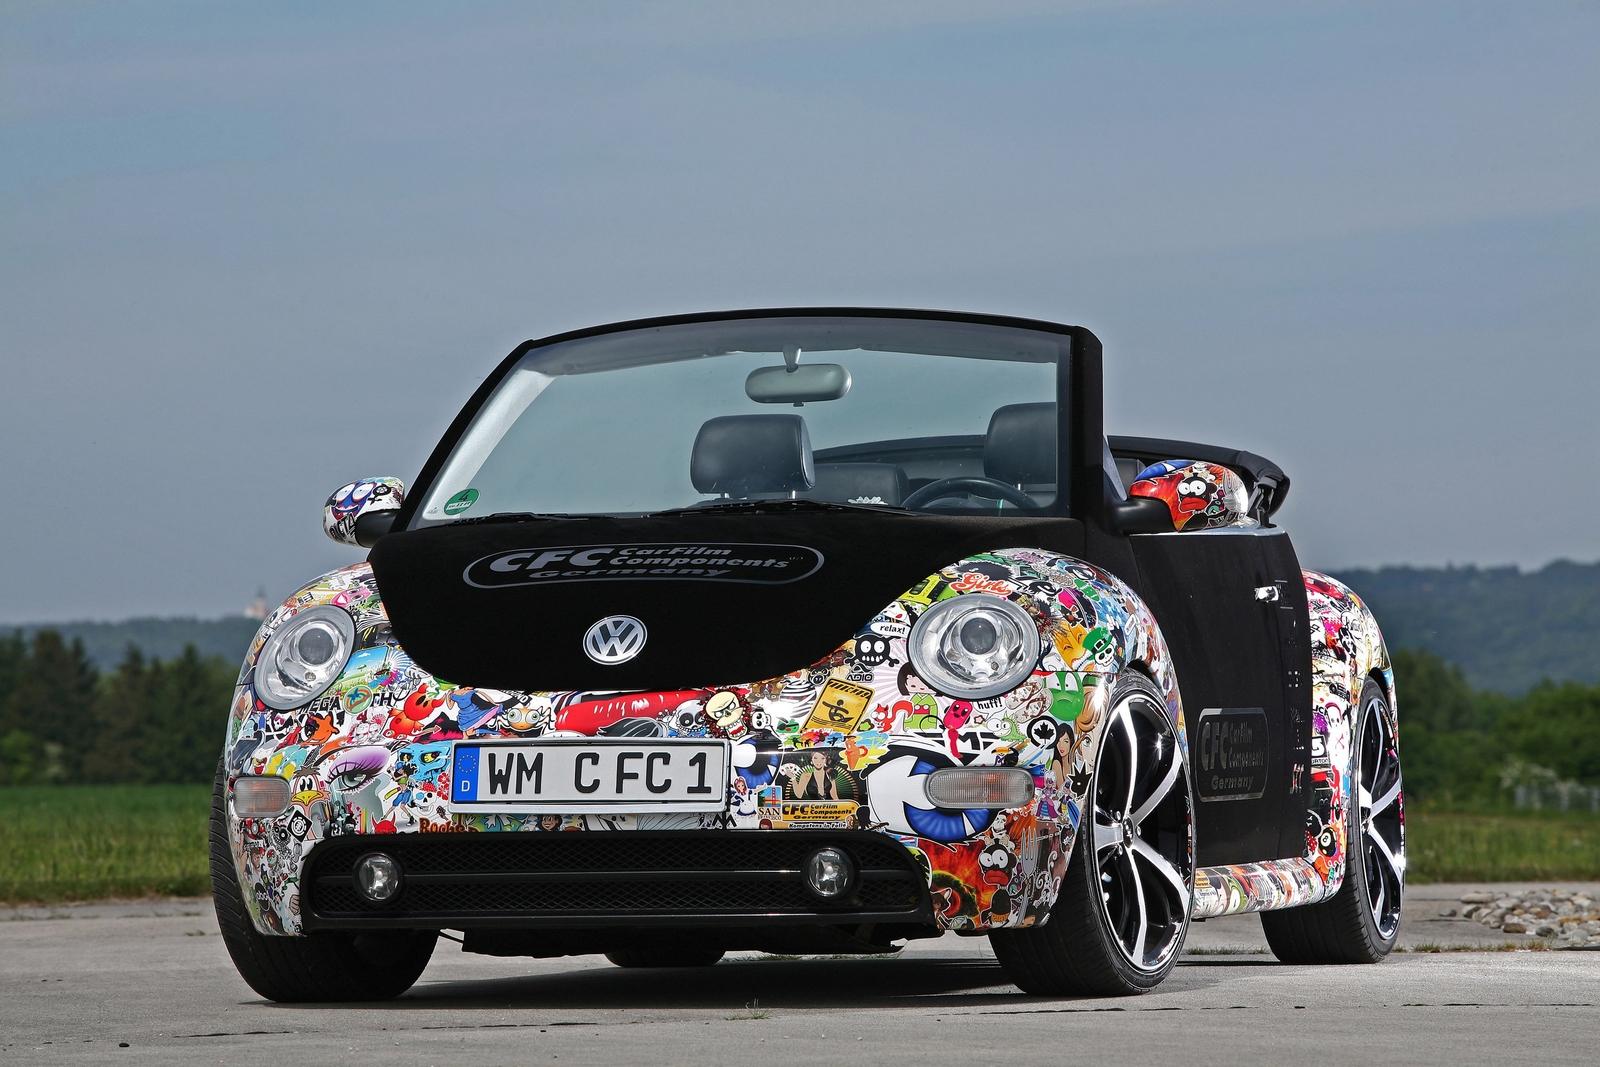 Sticker bomb car design - Cfc Beetle Stickerbomb